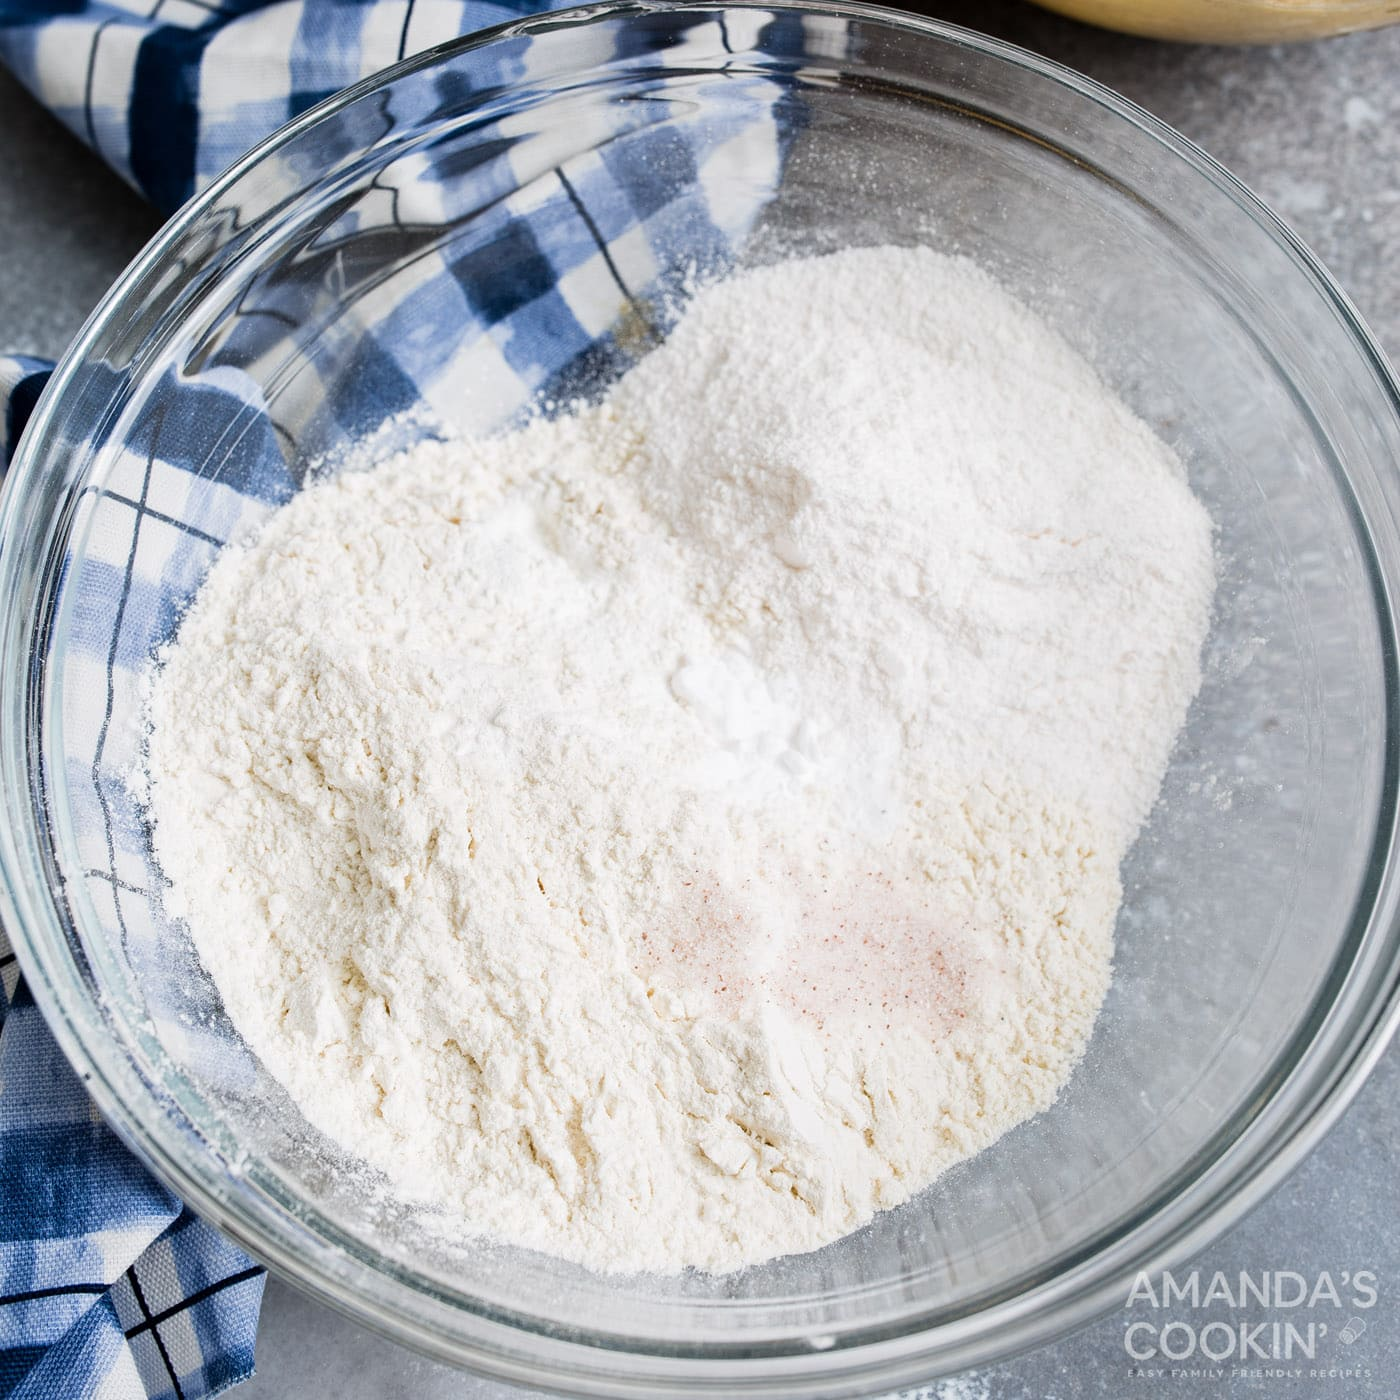 dry ingredients in mixing bowl